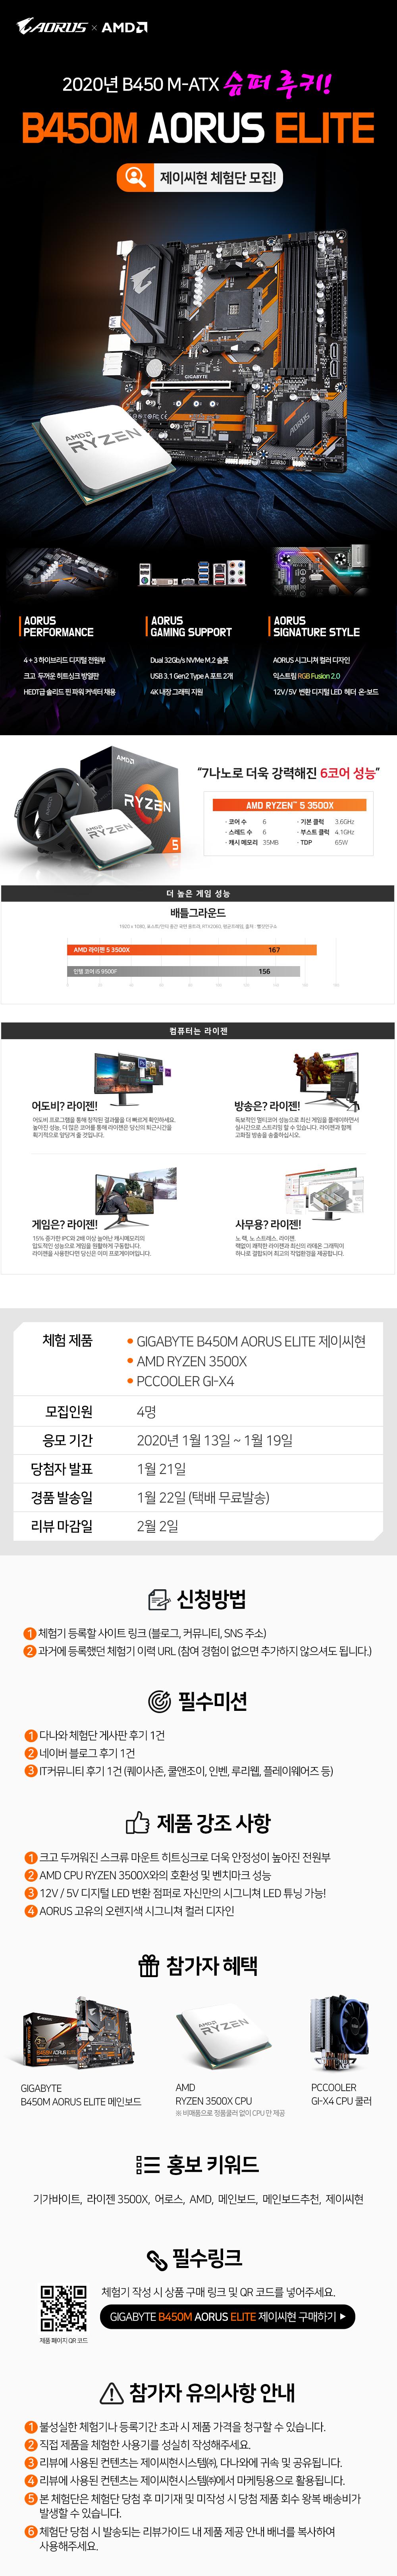 B450M AORUS ELITE 제이씨현 체험단 모집 페이지